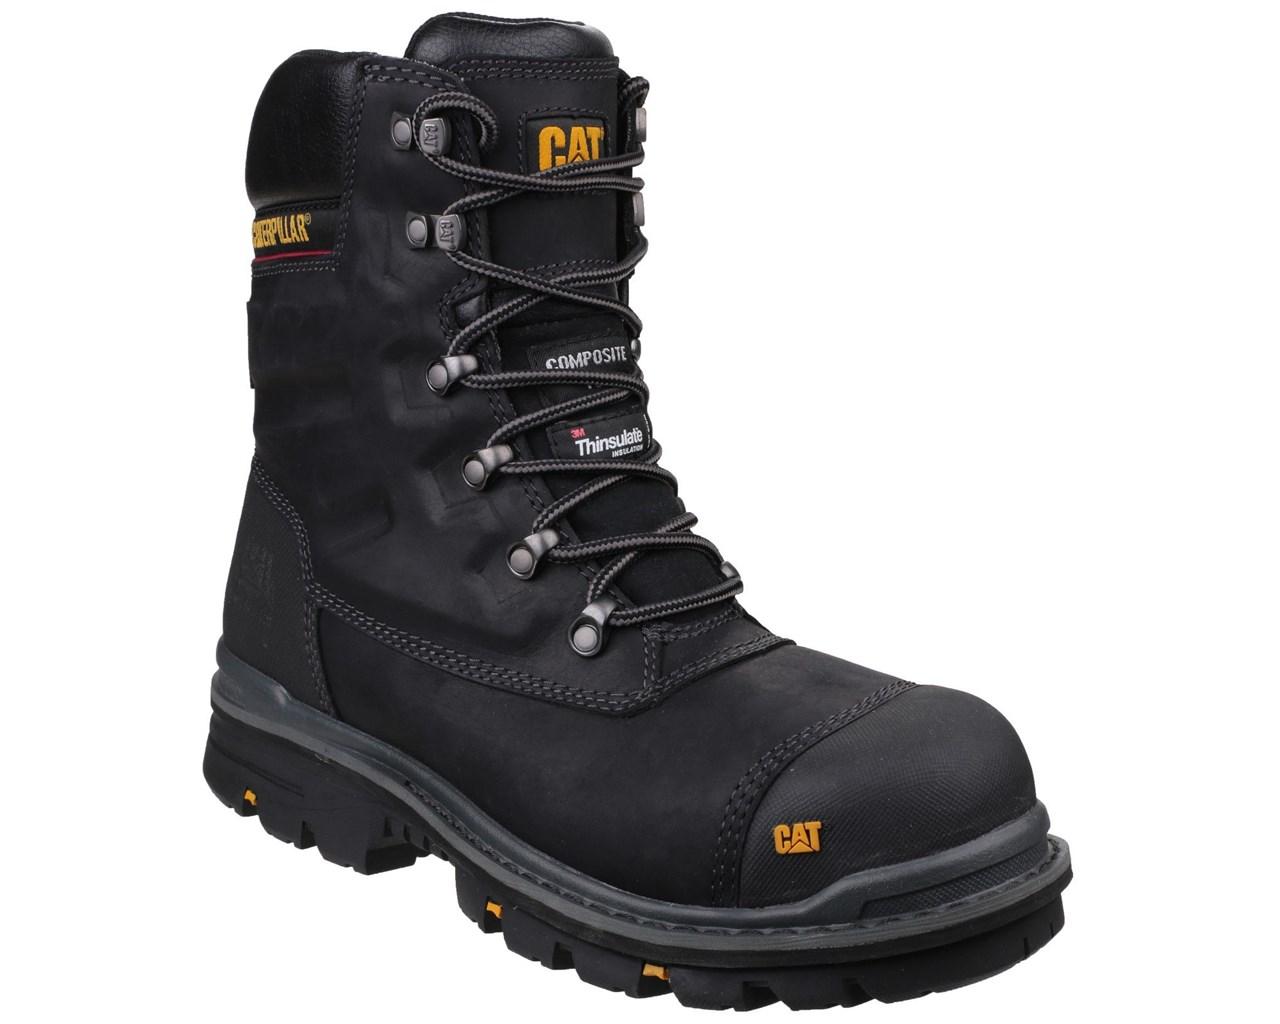 Details About Caterpillar Cat Premier S3 Black Safety Combat Side Zip Boots Rigger Midsole